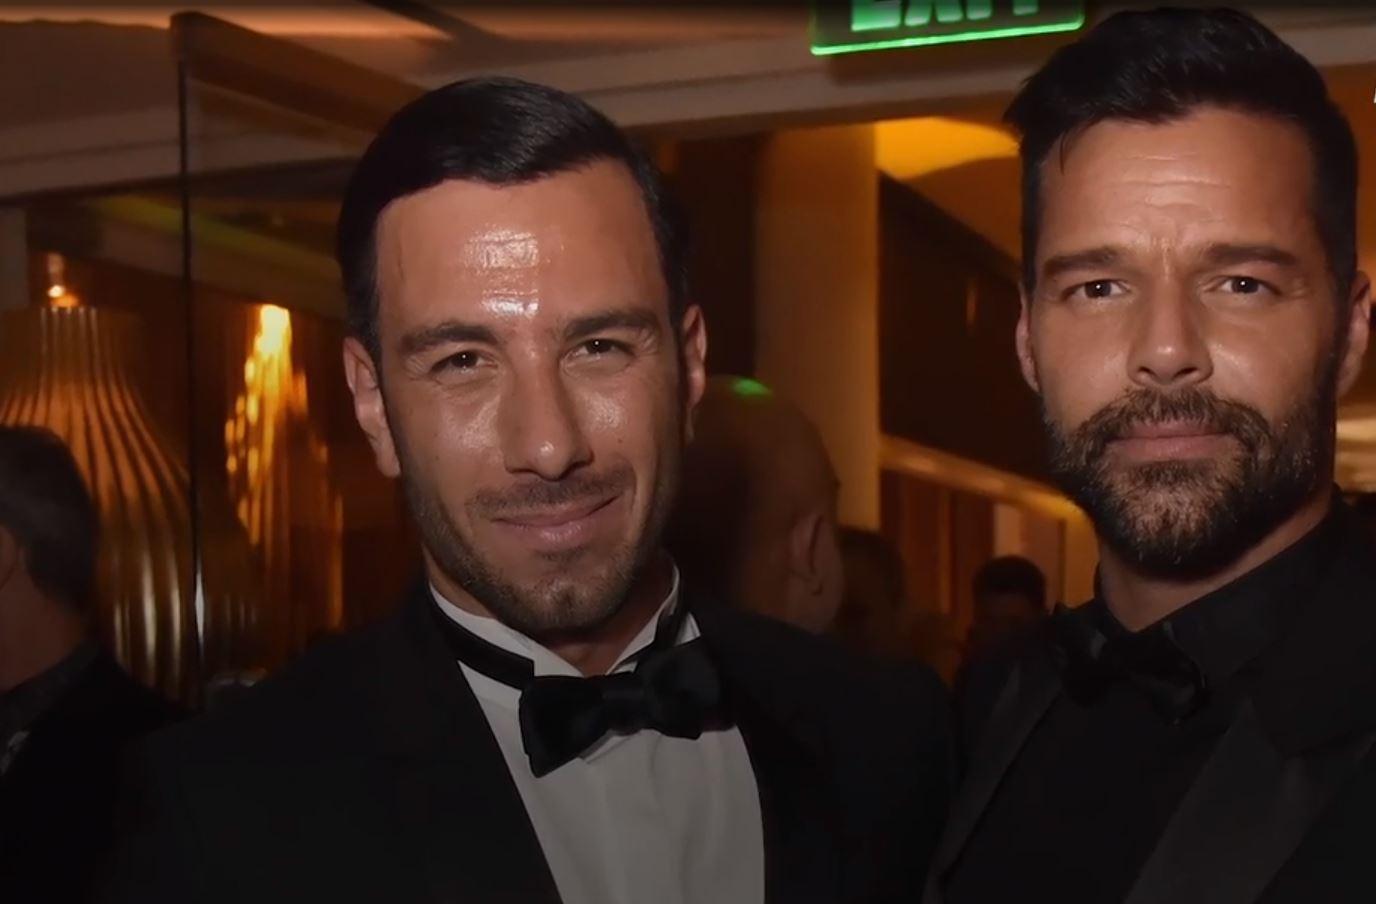 Martohet Ricky Martin dhe partneri i tij